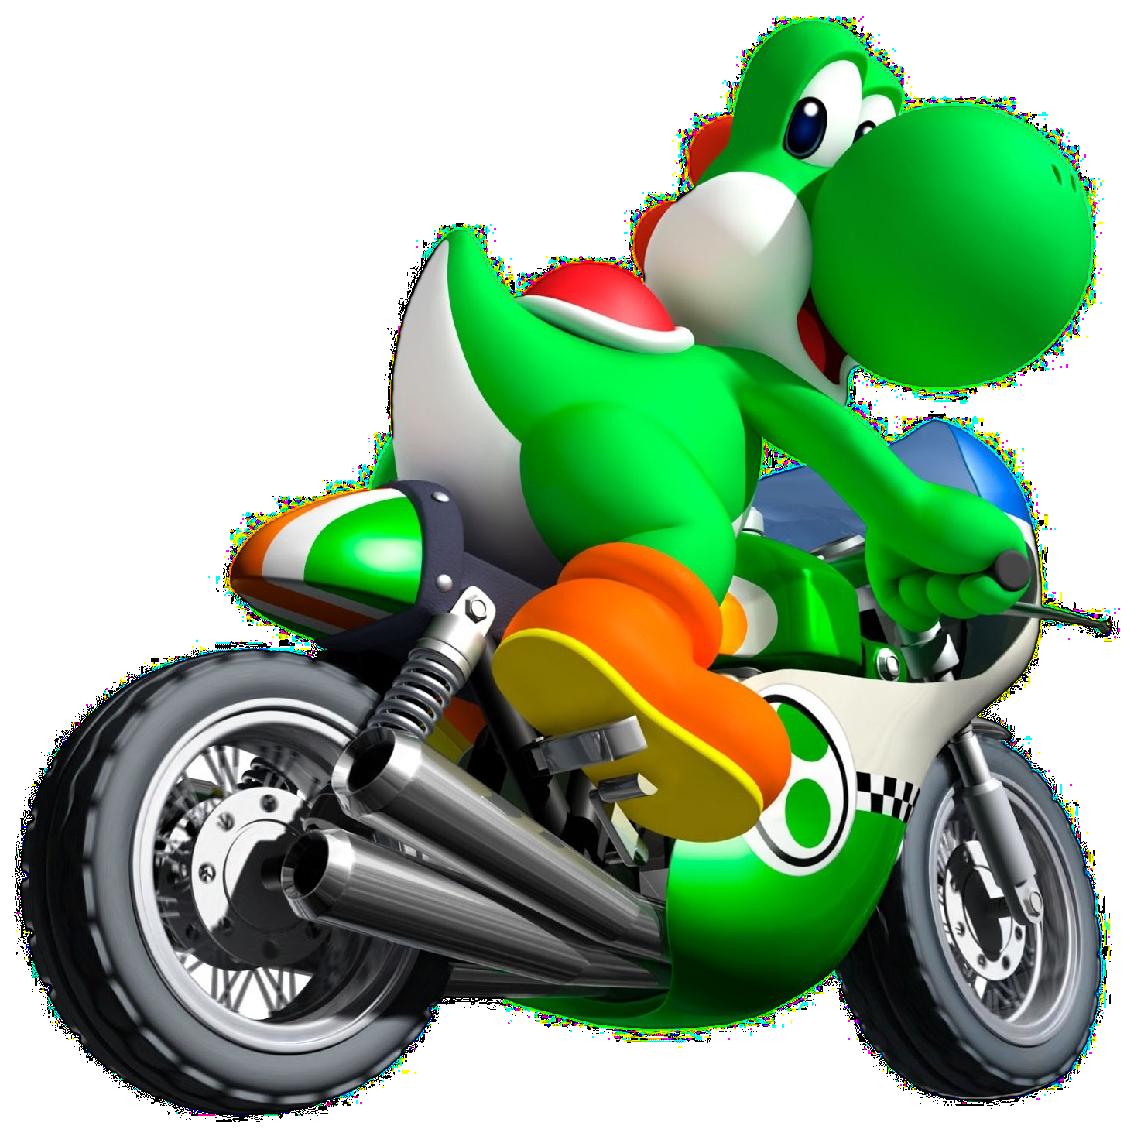 Yoshi Mario Kart Wii Mario Mario Kart Characters